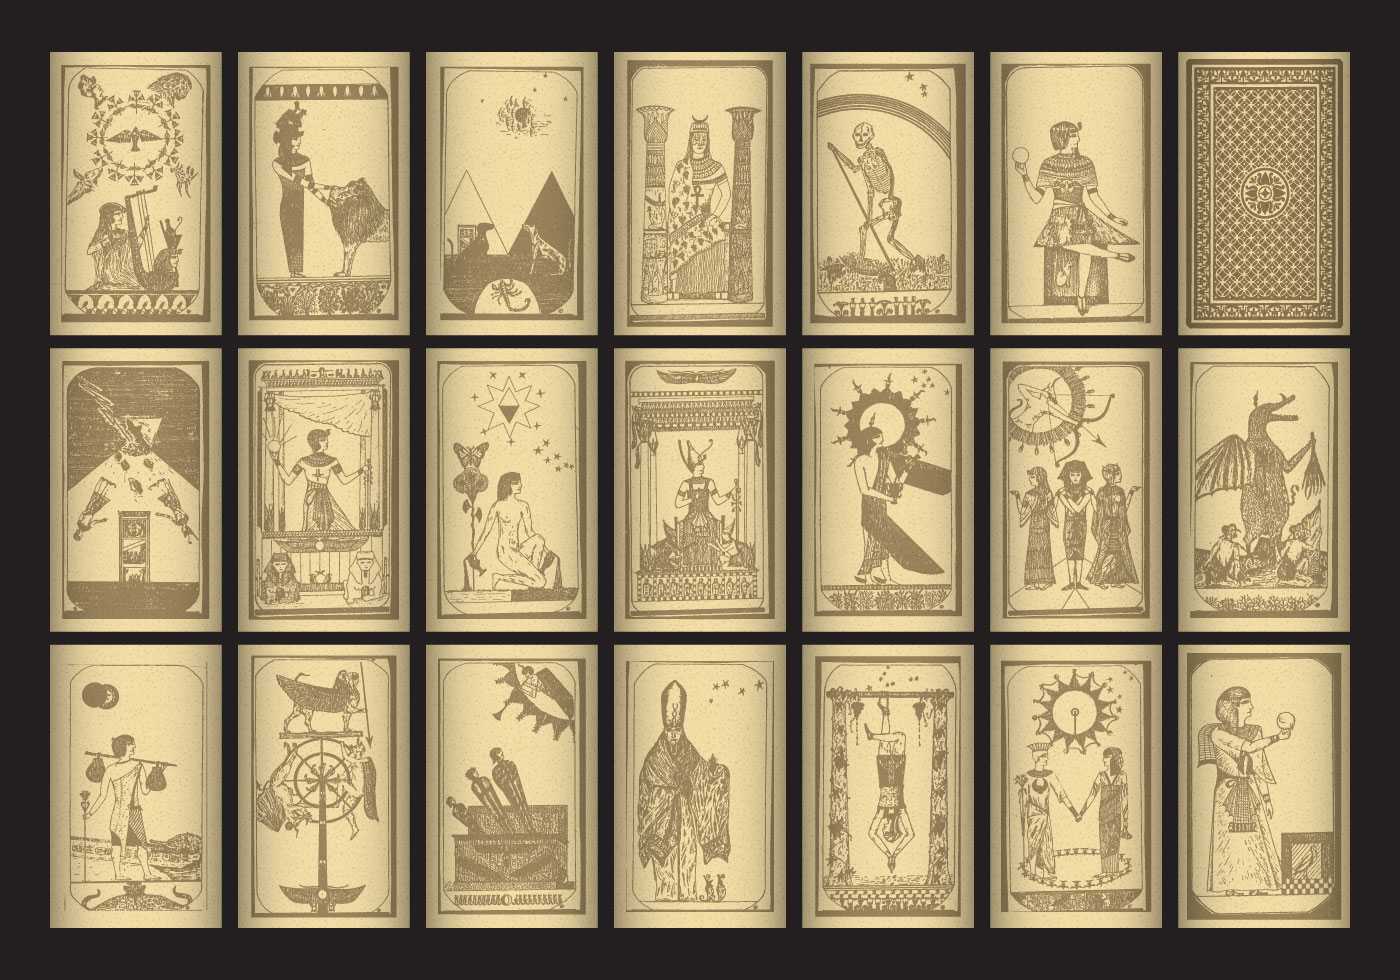 Egypt Tarot - Download Free Vector Art, Stock Graphics ... Crystal Ball Fortune Teller